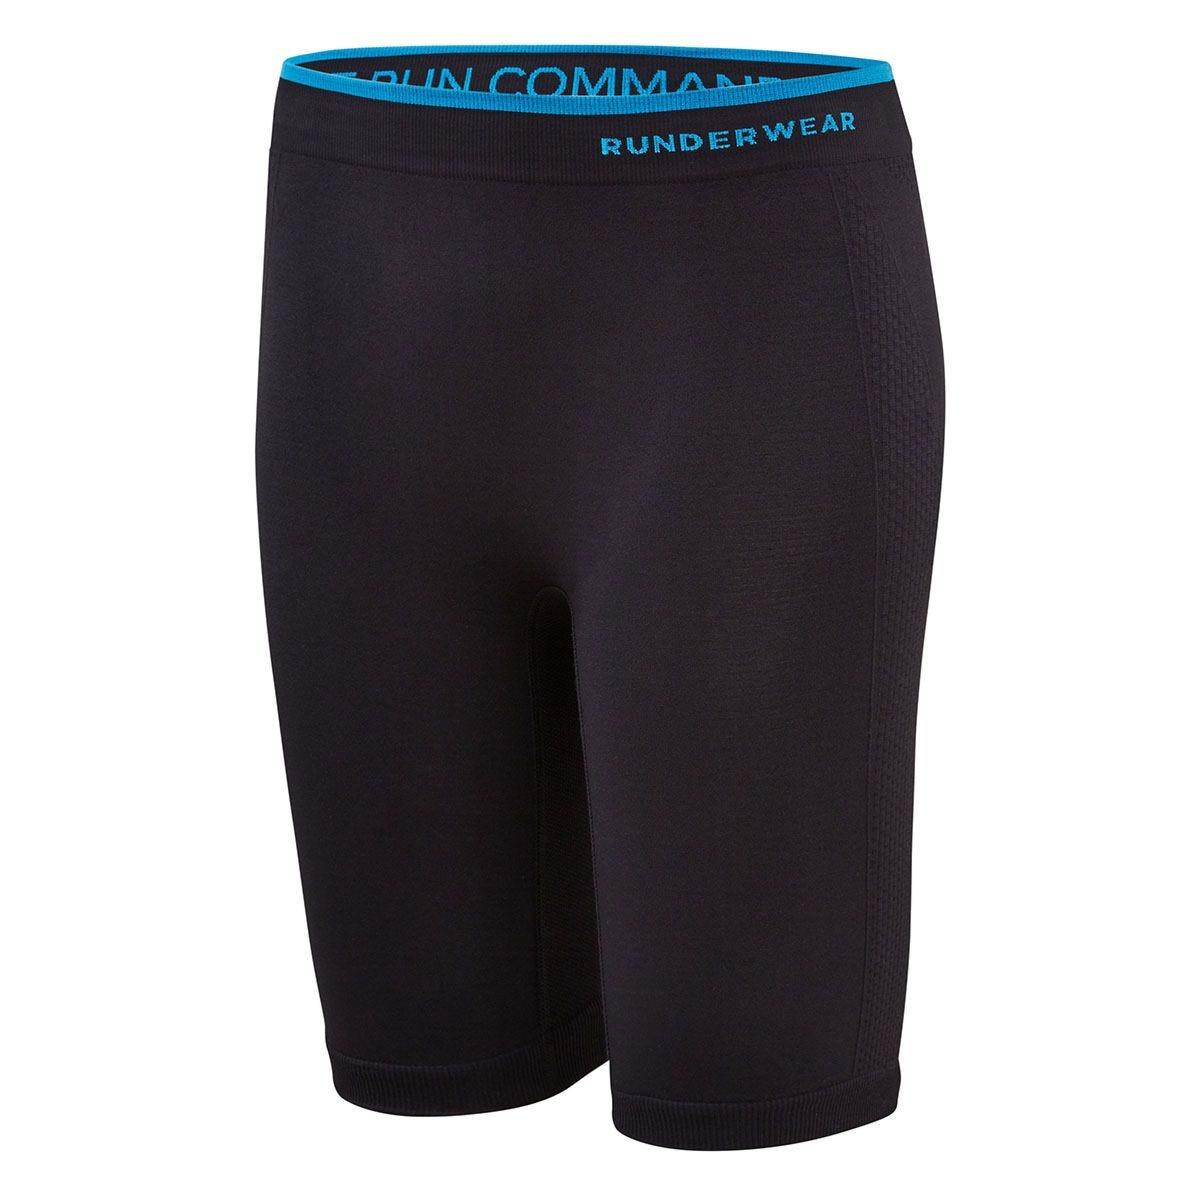 Runderwear Women's Long Shorts - Chafe-Free Medium-Black